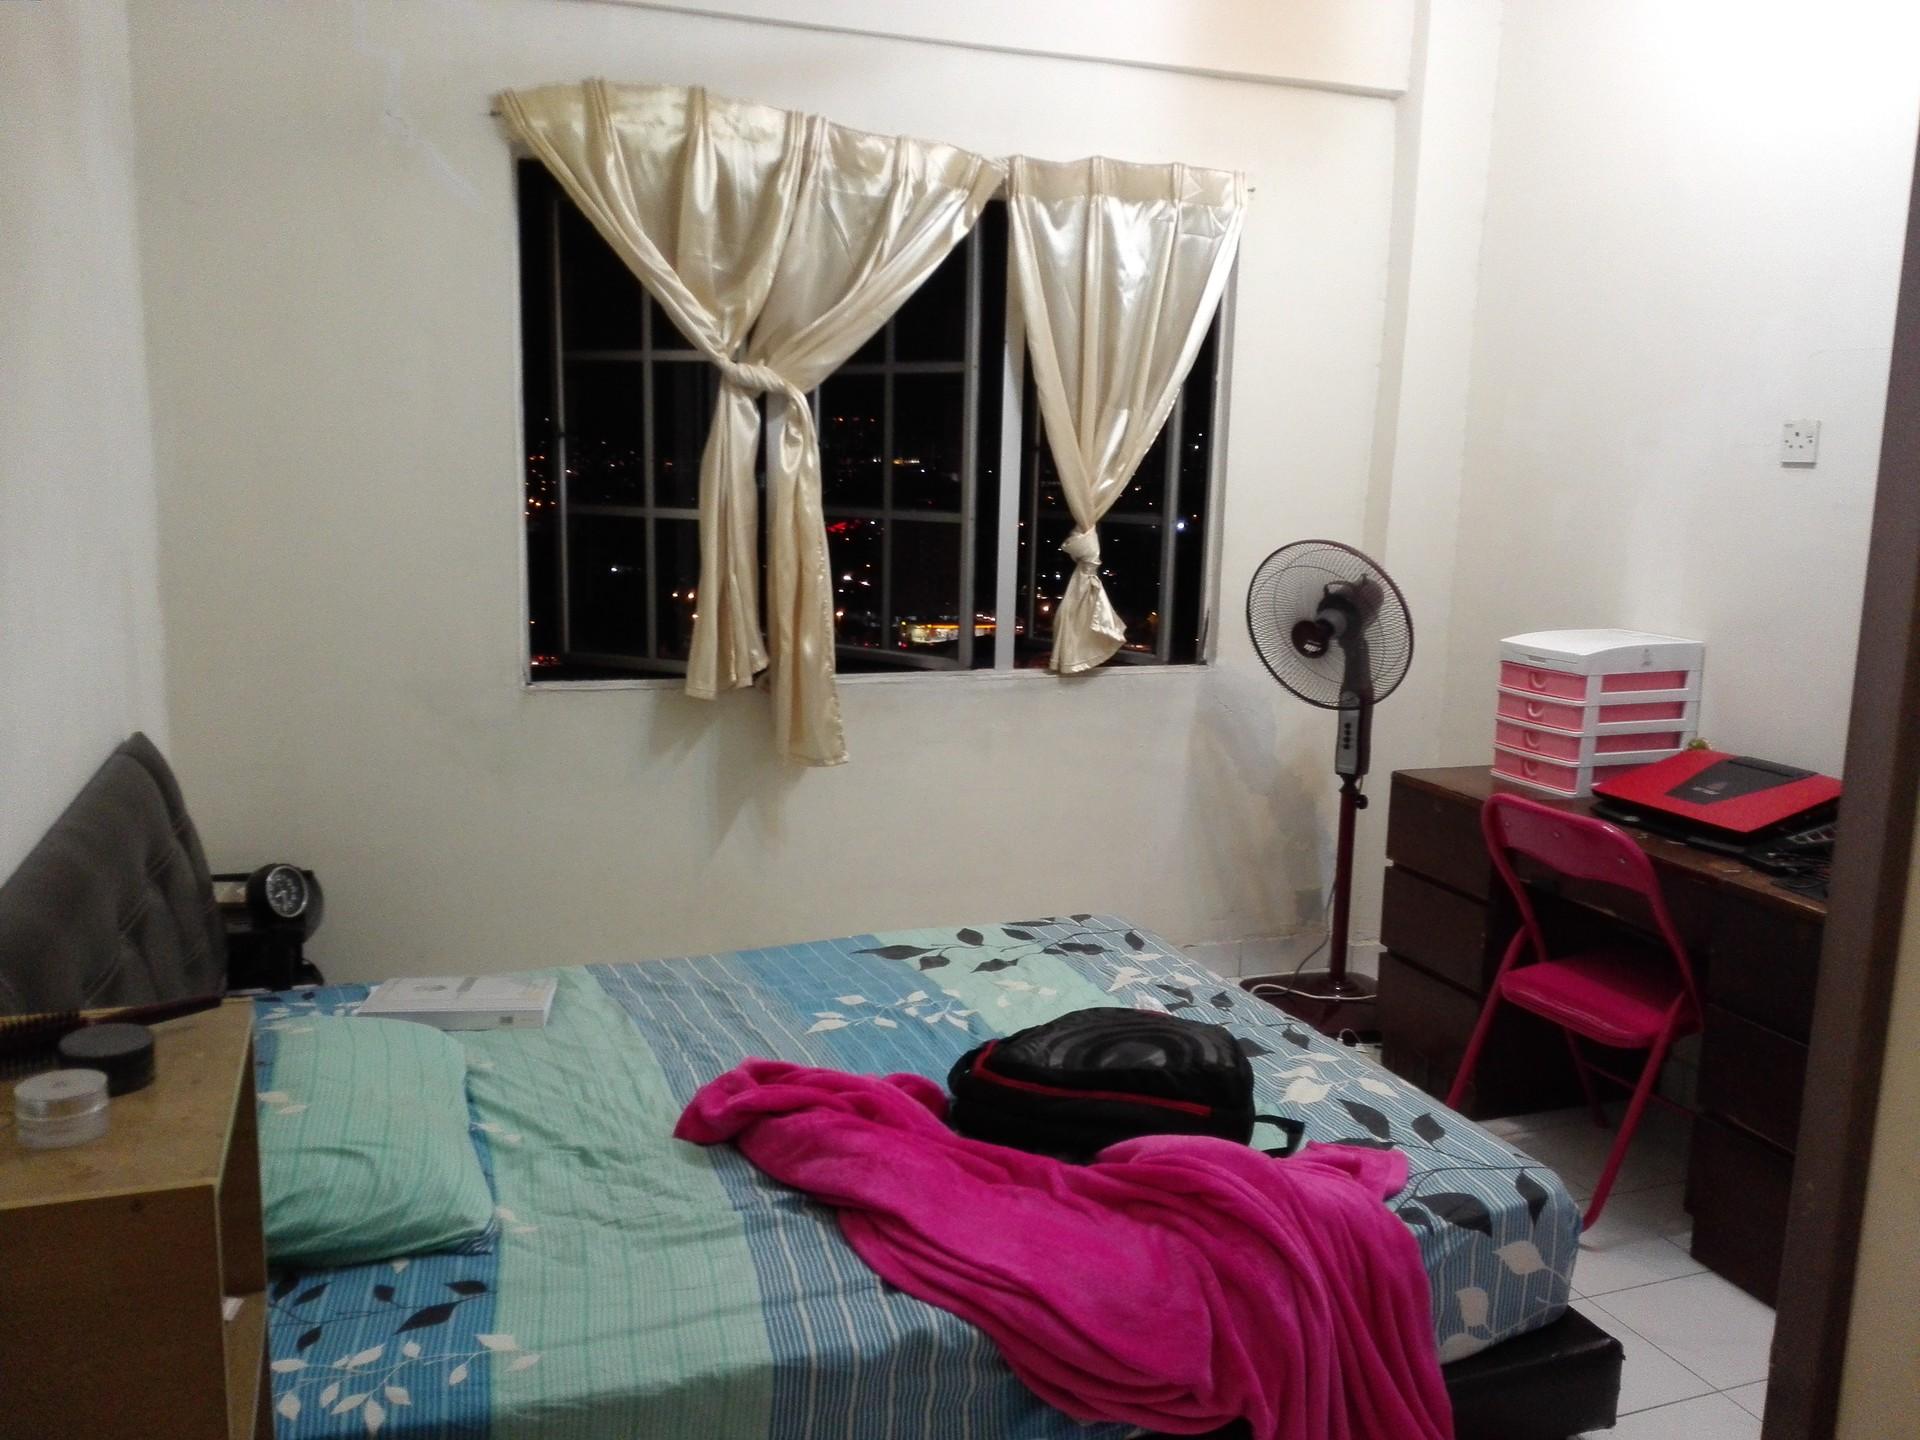 mawar-apartment-sentul-33bdbbb446a0e58a096478052912078f